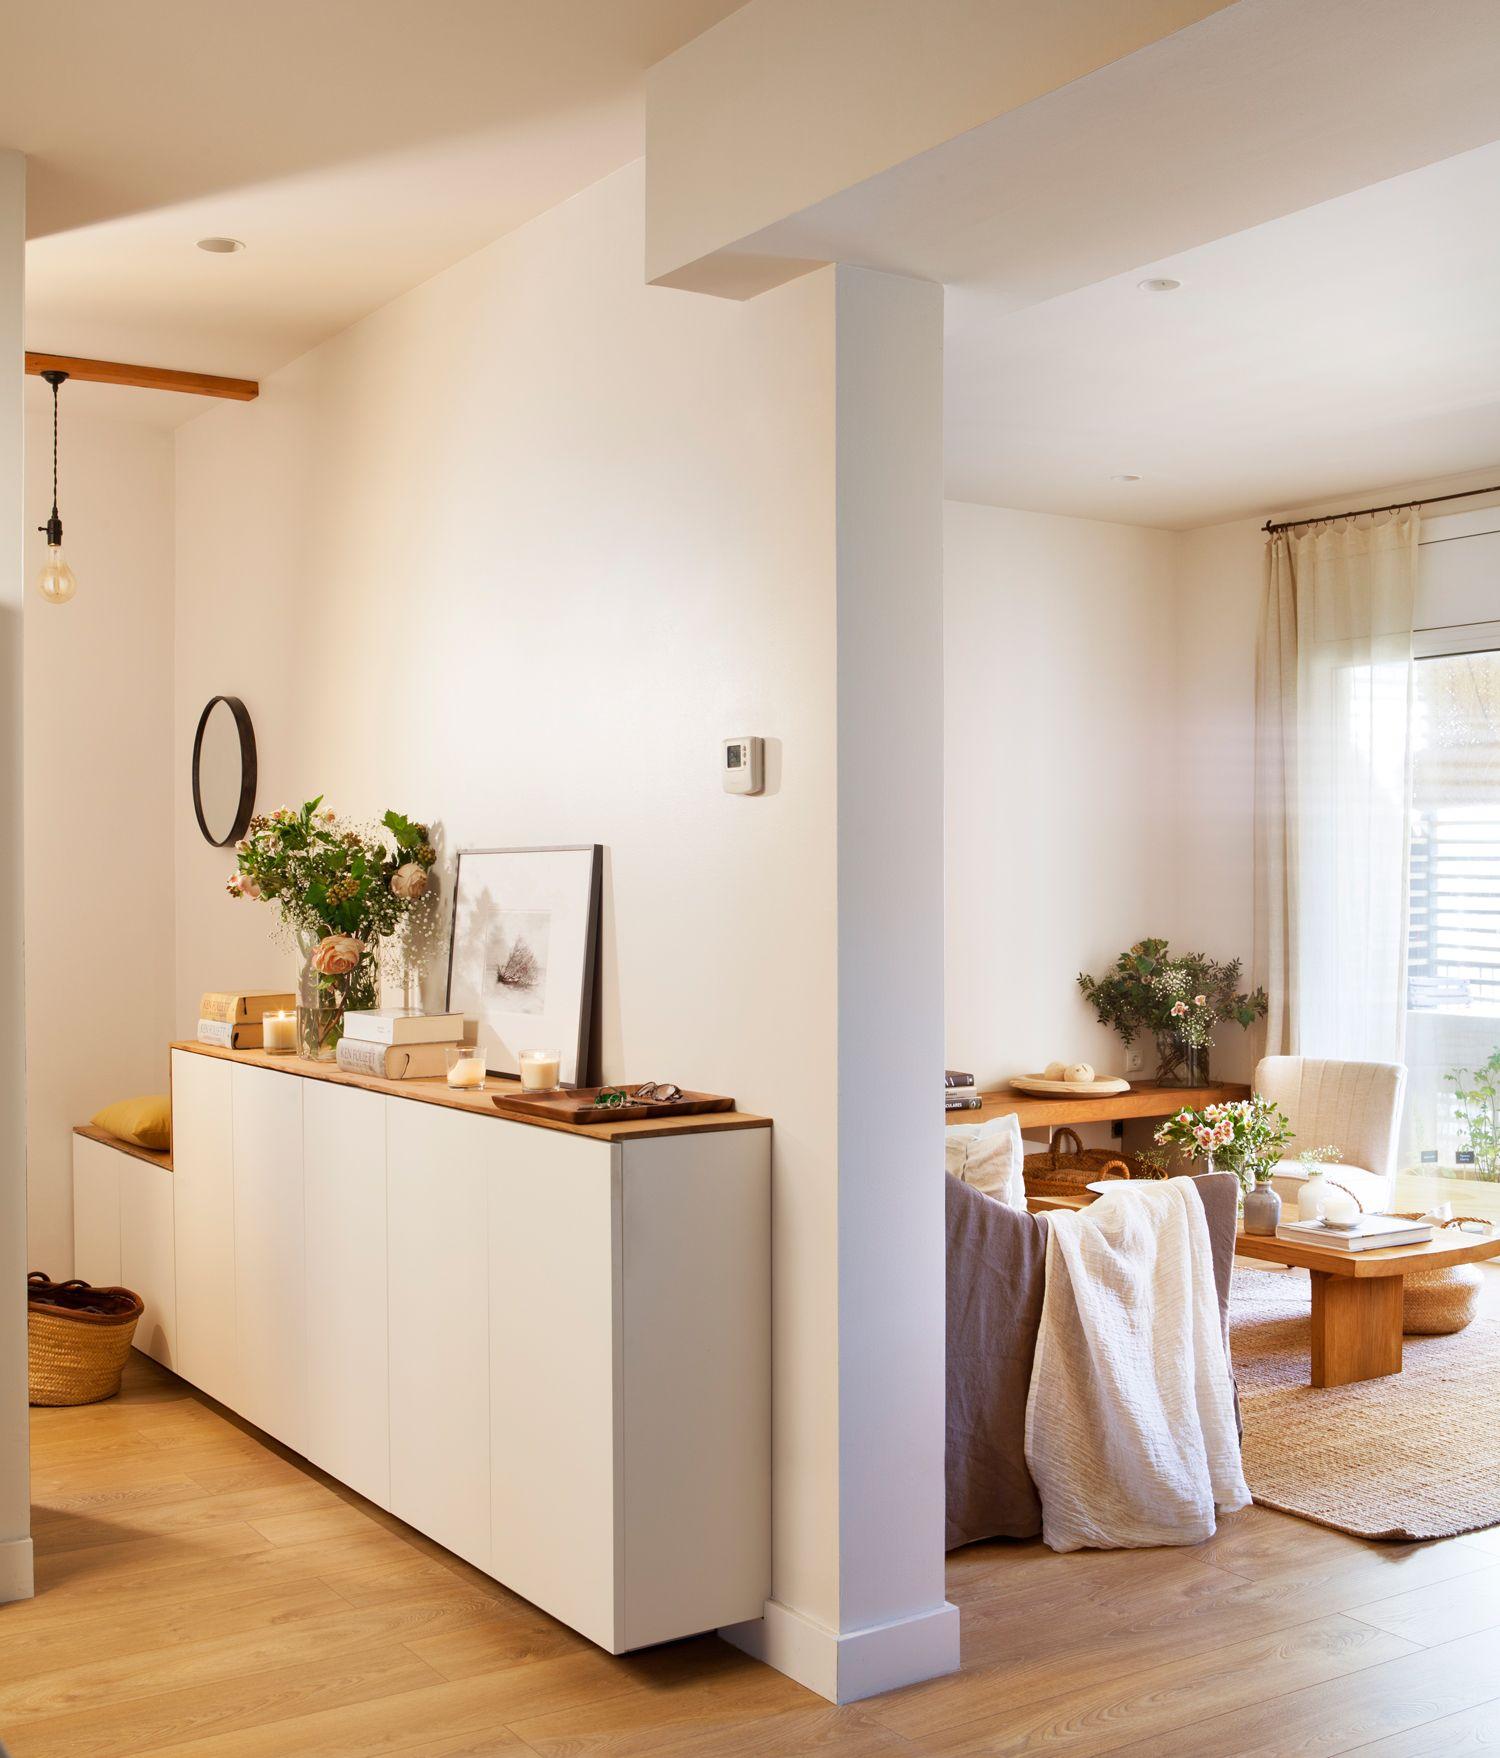 10 ideas geniales para recibidores pequeños | New home | Pinterest ...